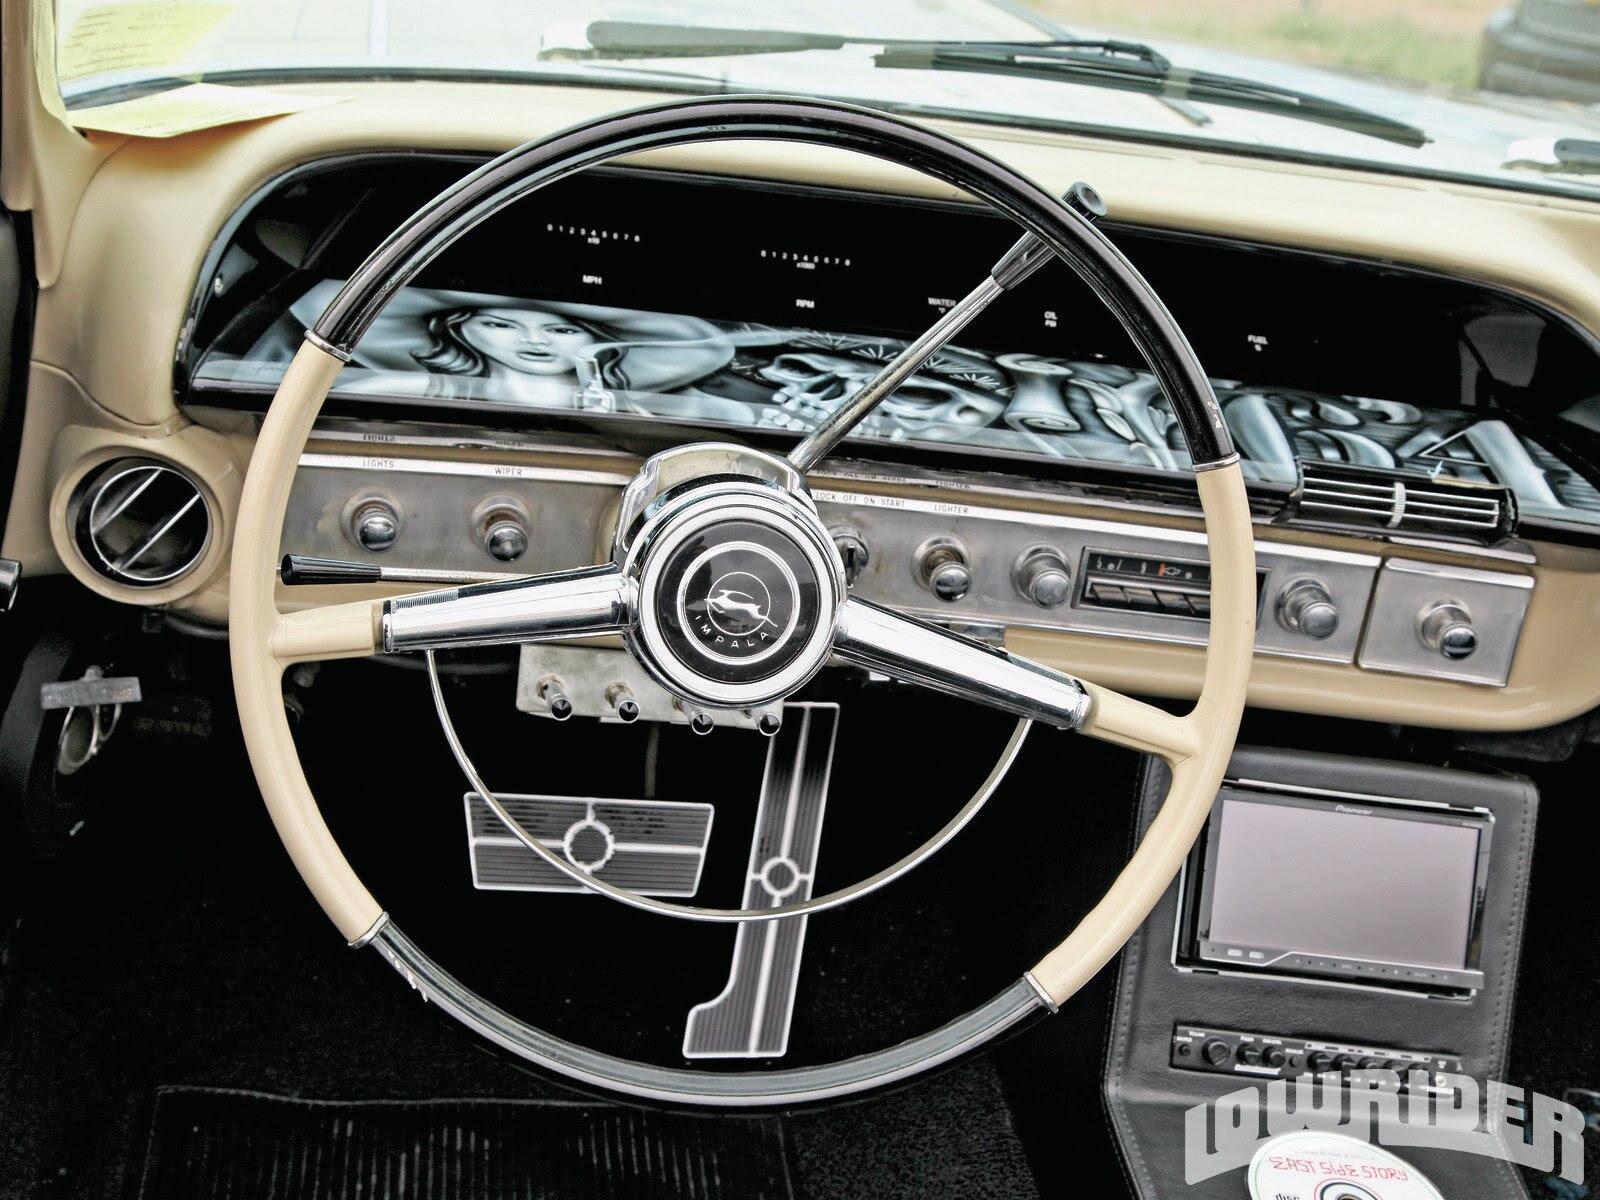 1964 Chevrolet Impala Lowrider Magazine